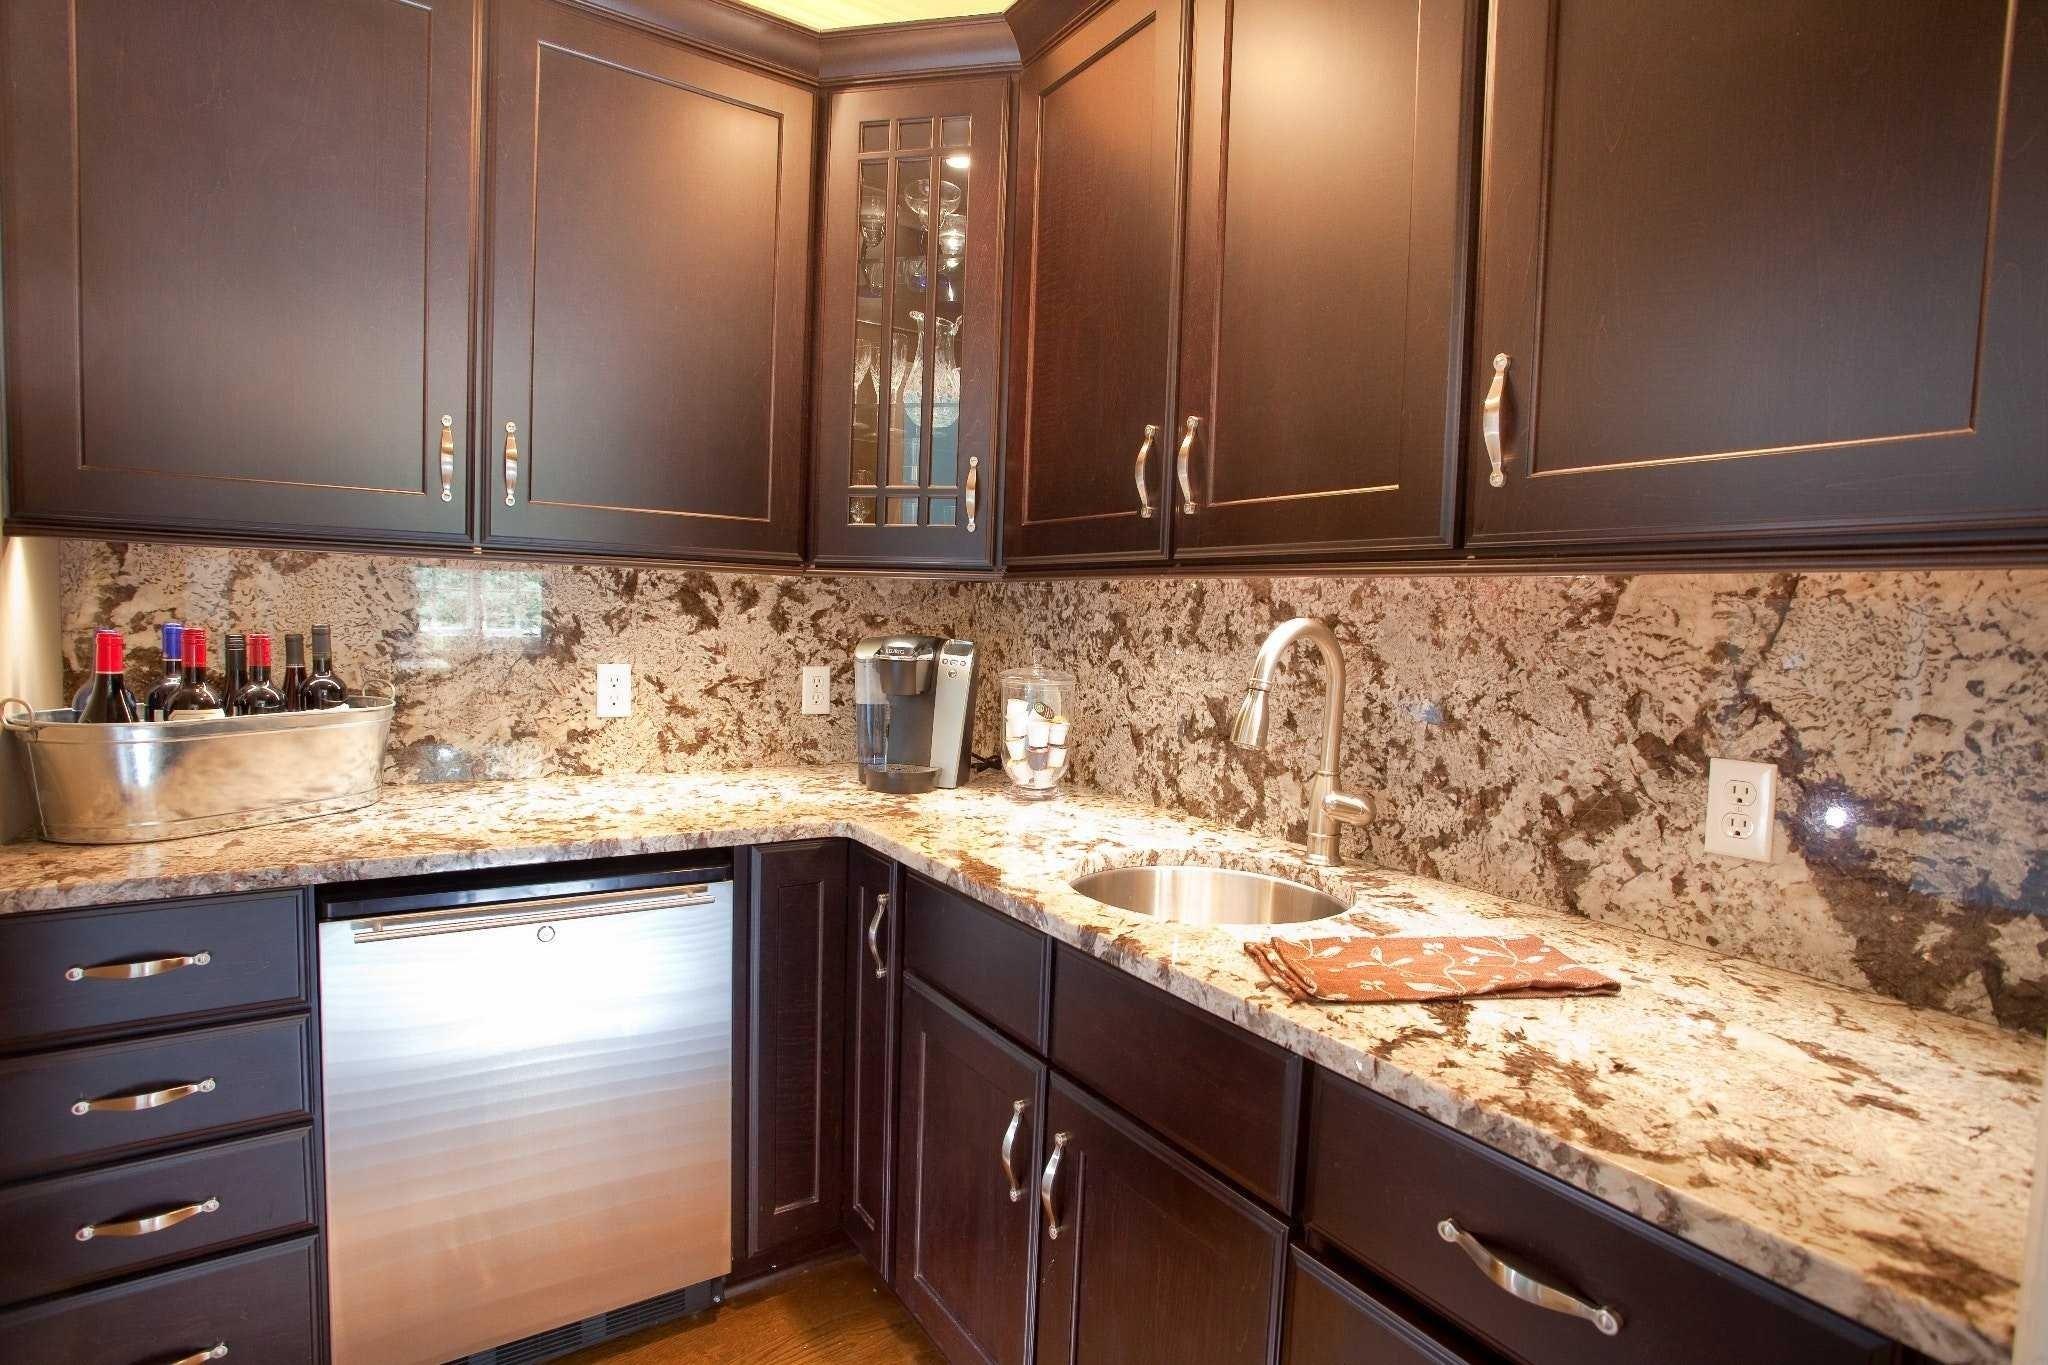 10 Gorgeous Ideas For Kitchen Backsplash With Granite Countertops backsplash ideas for kitchens with granite countertops kitchen 2018 1 2020